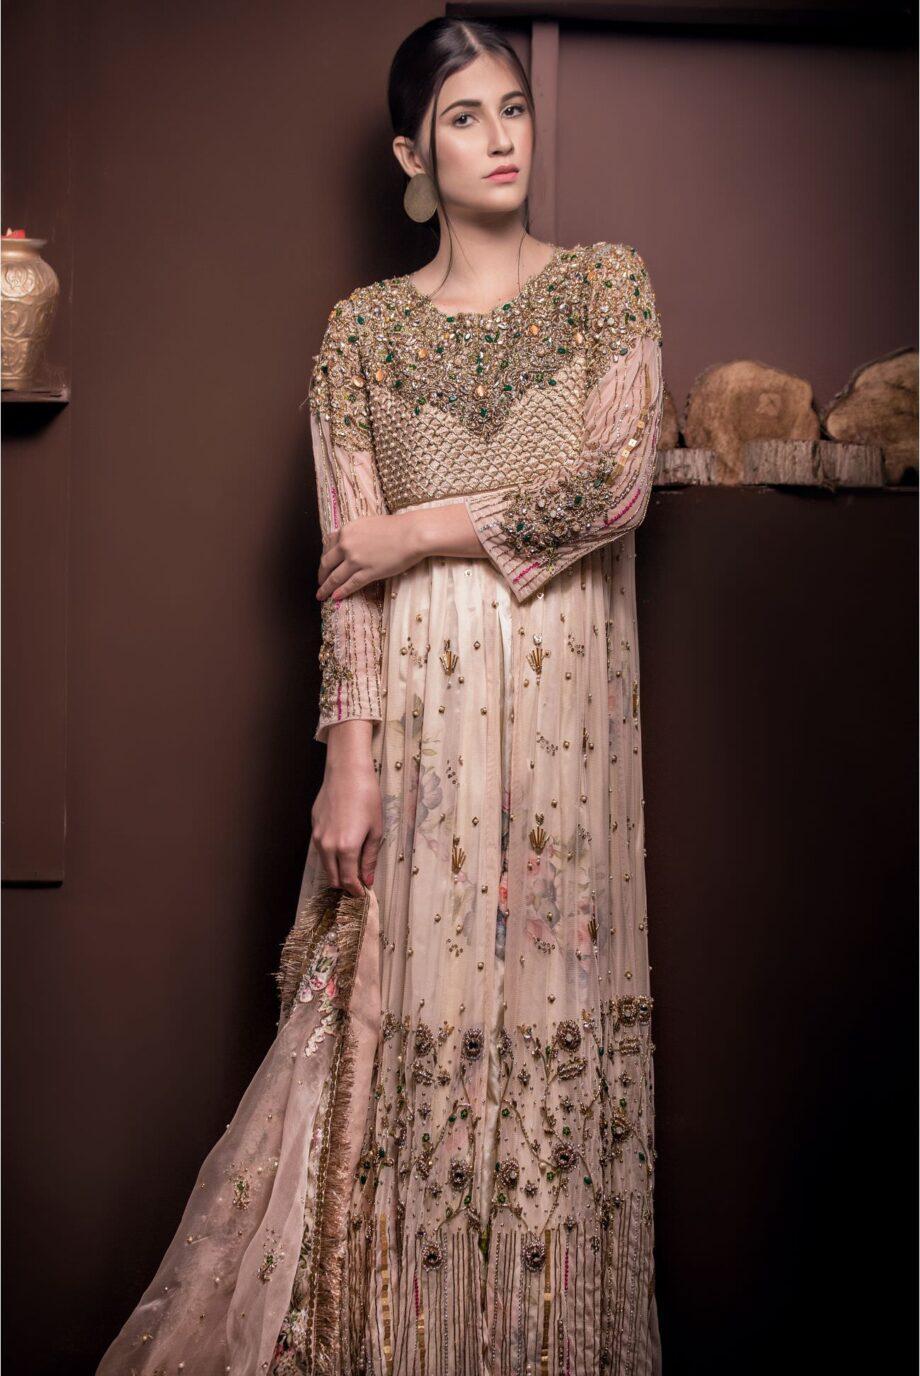 Buy Exclusive Light Pearl Peach Shadi And Valima Dress – Sabd208 Online In USA, Uk & Pakistan - 01